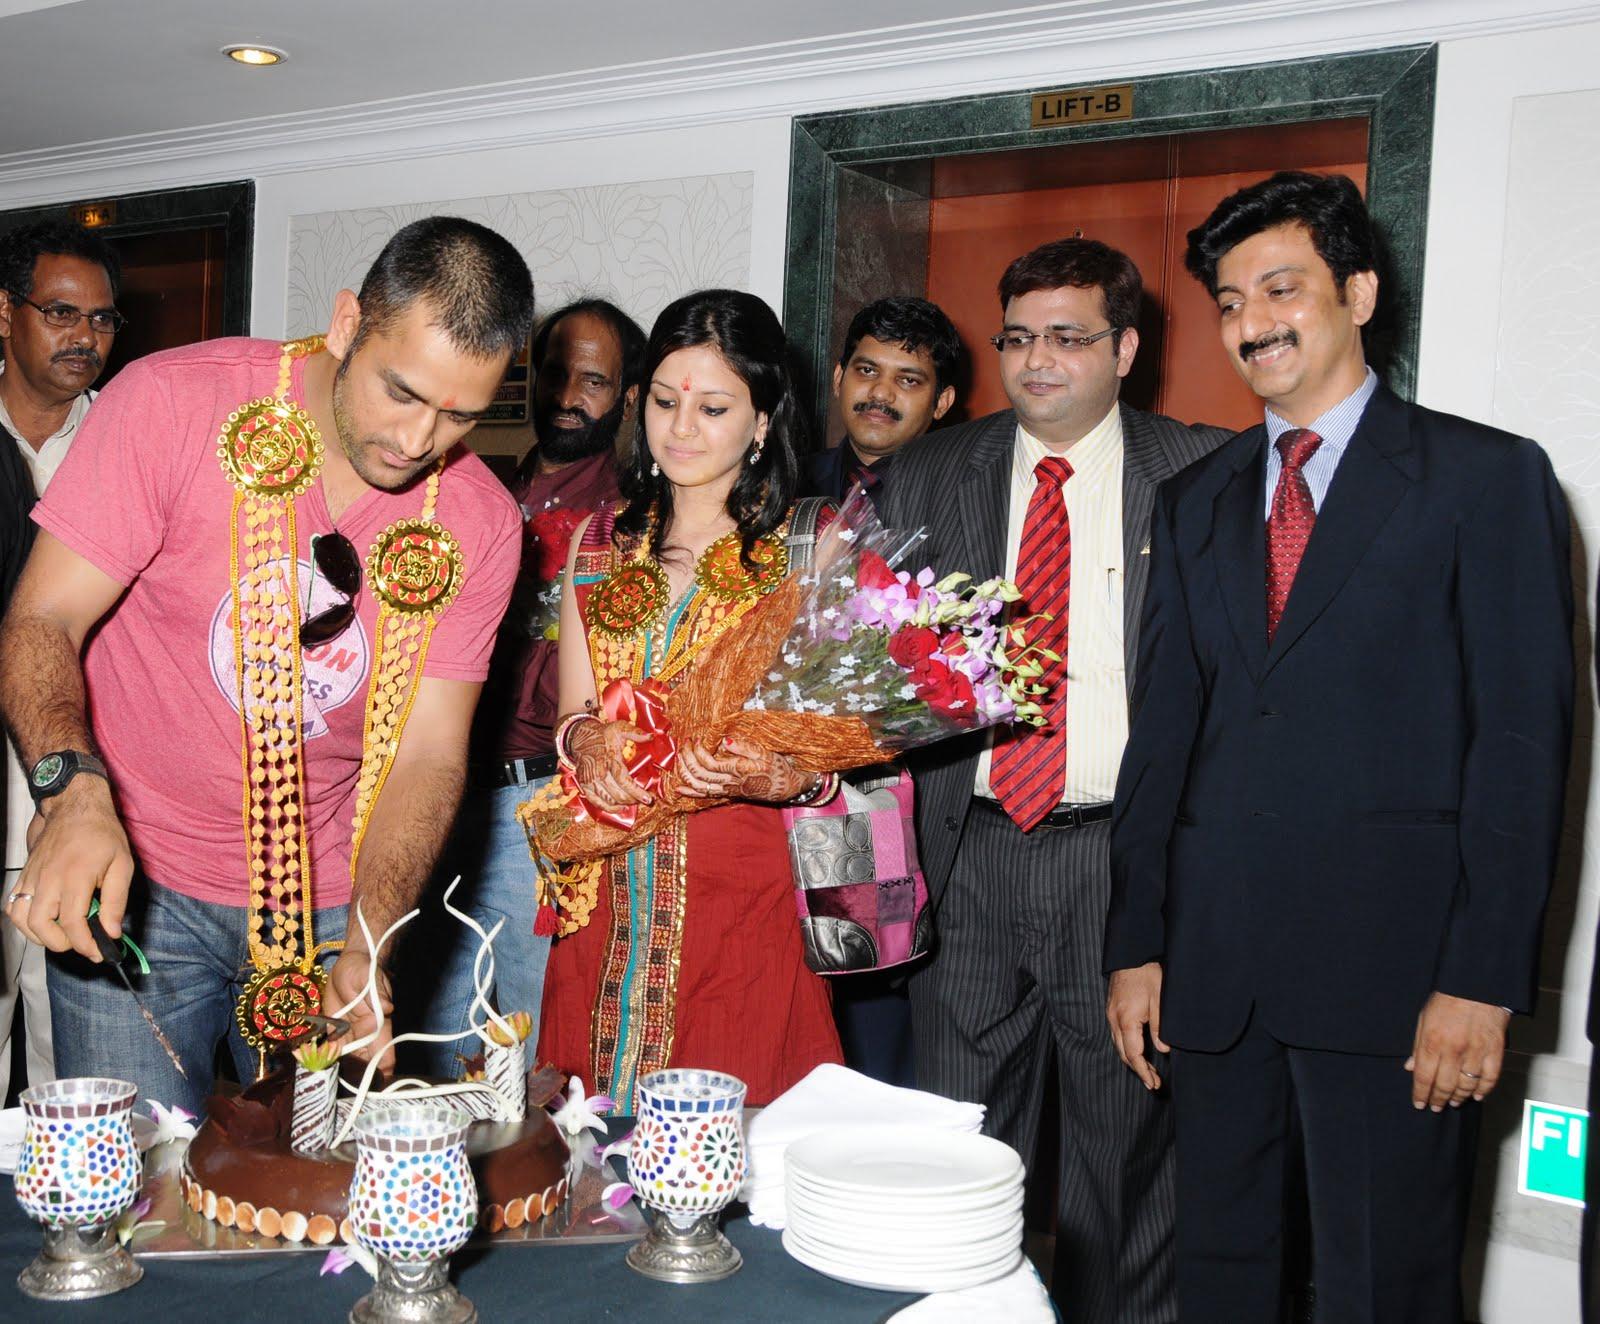 Radisson Hotel GRT Chennai Employee Blogspot: Indian Team ...